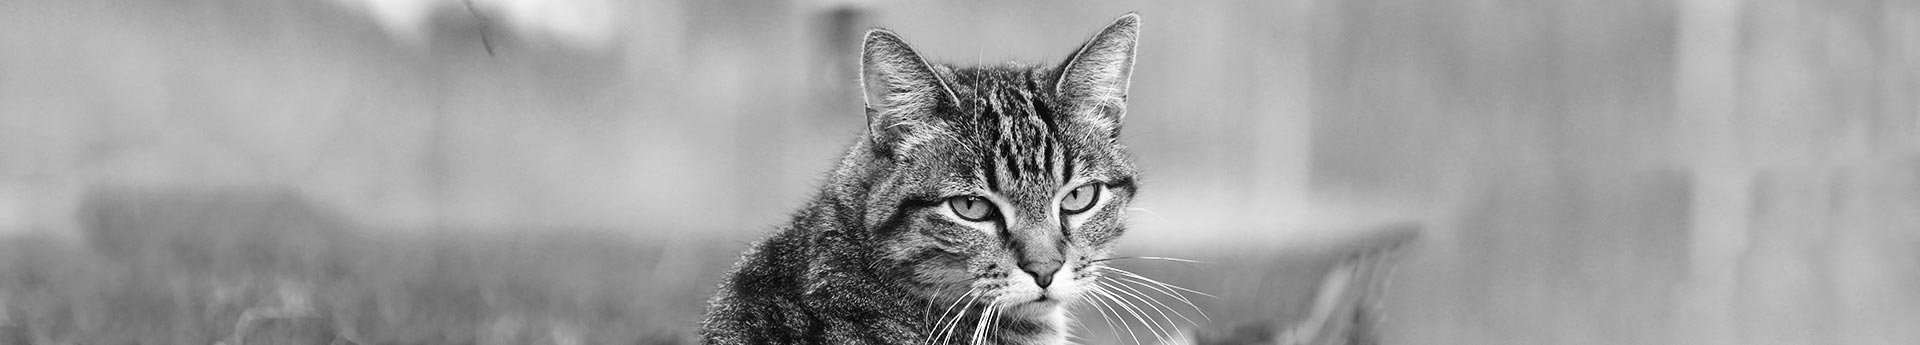 ORIJEN Regional Red Dry Cat Food - Cat looking unconcerned - Louie from Churubusco, Indiana.